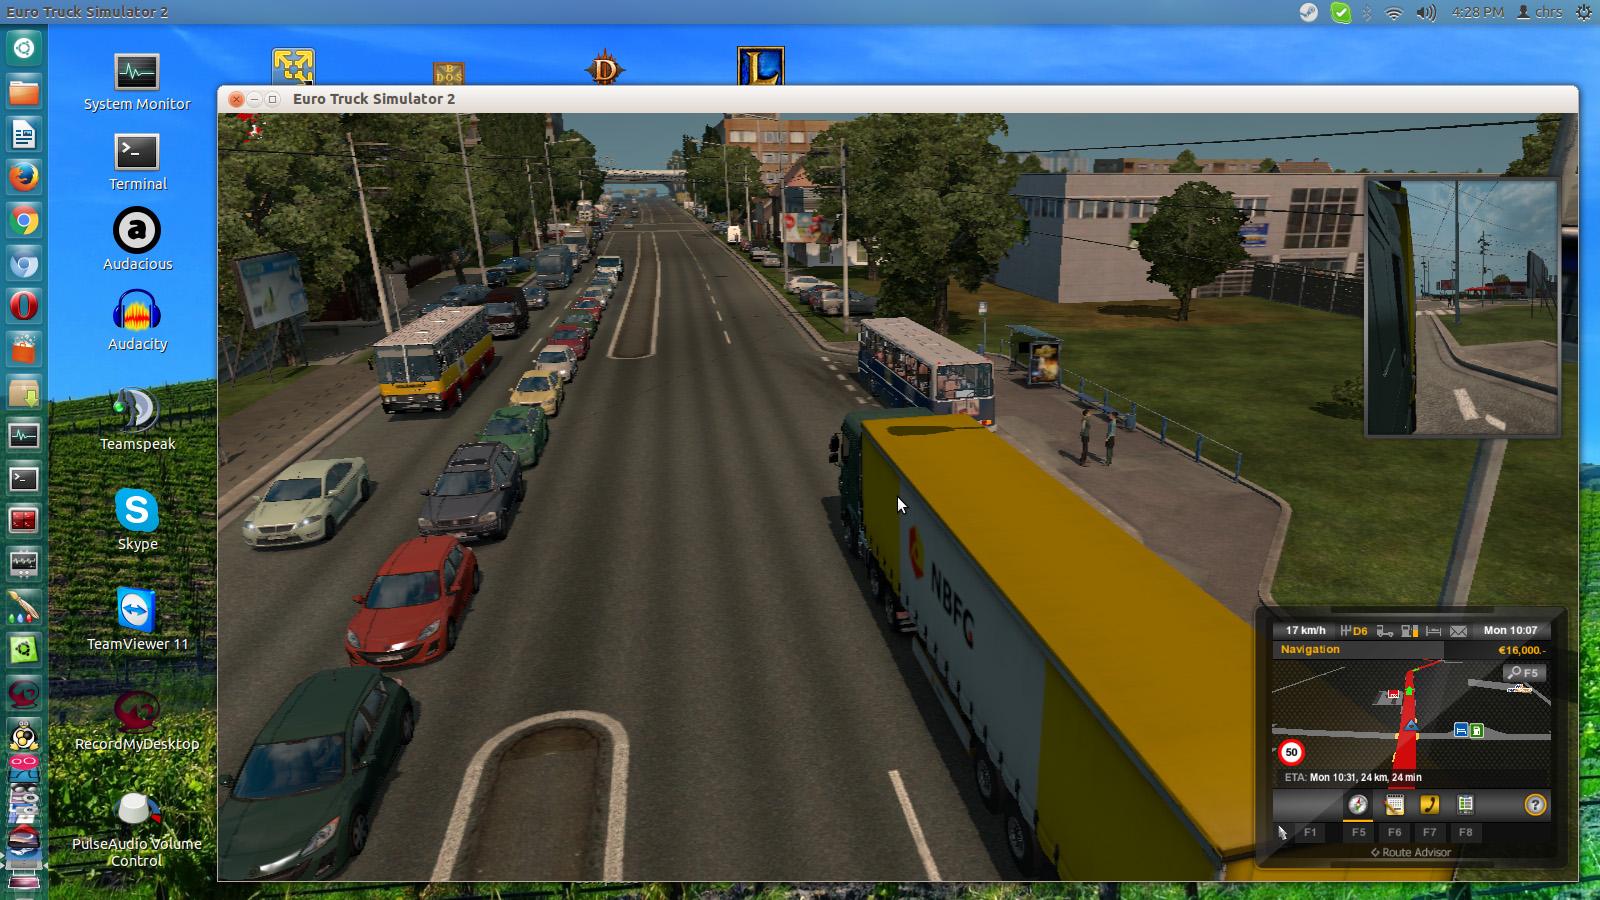 eurotruck_simulator_2_linux_2.jpg